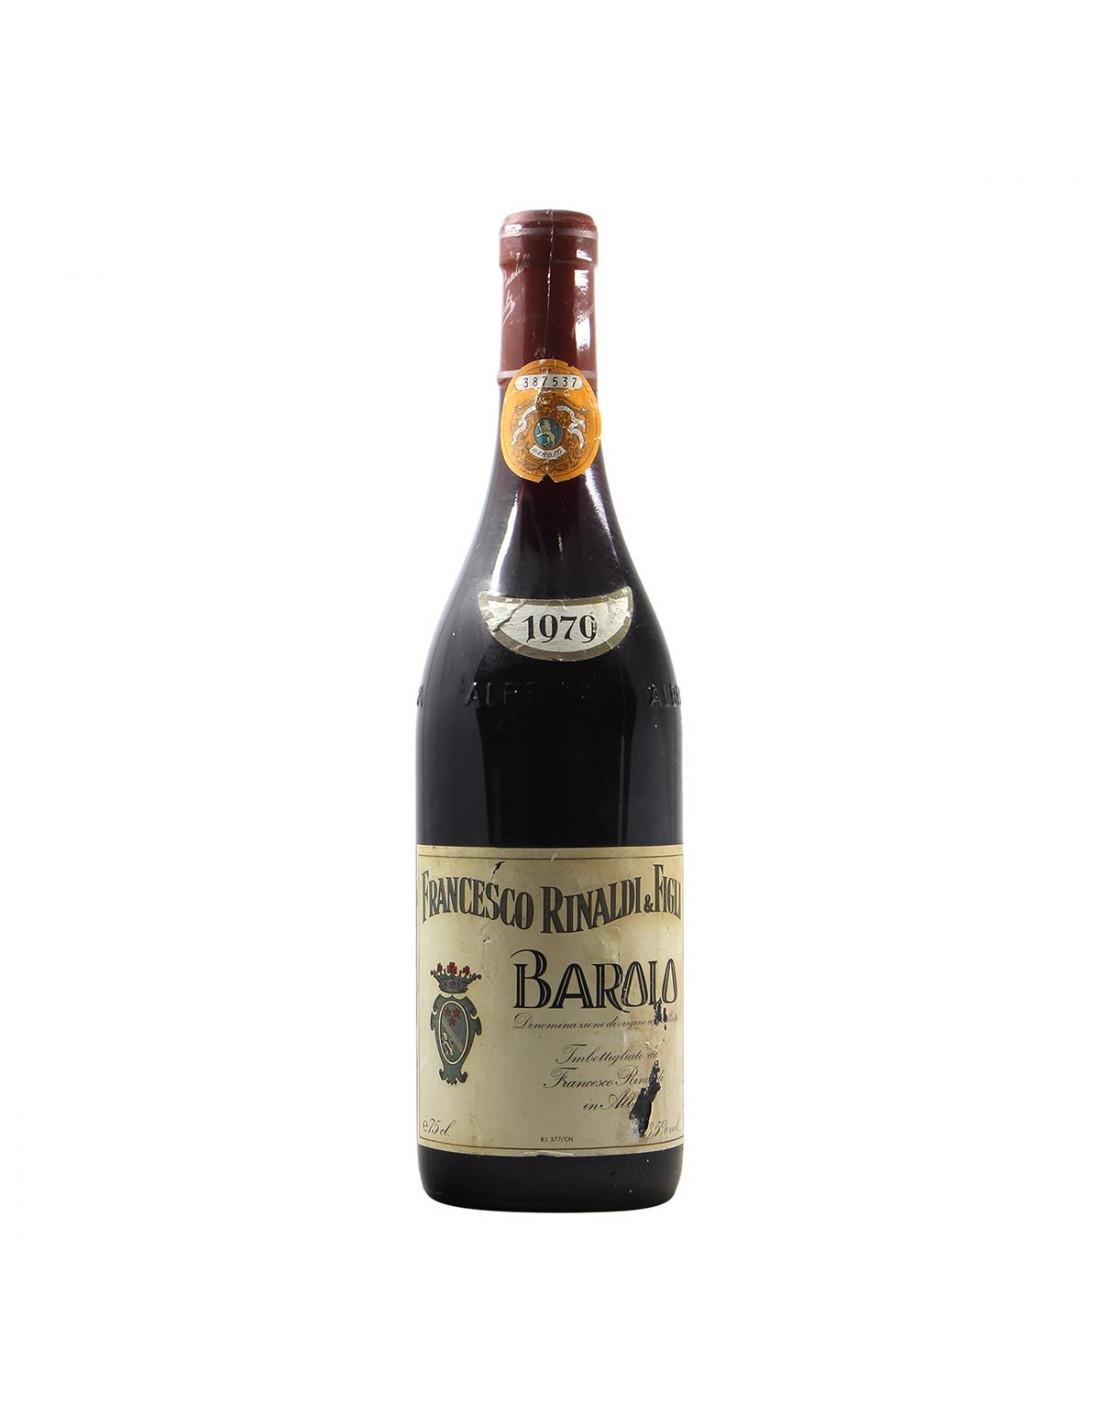 Francesco Rinaldi Barolo 1979 Grandi Bottiglie